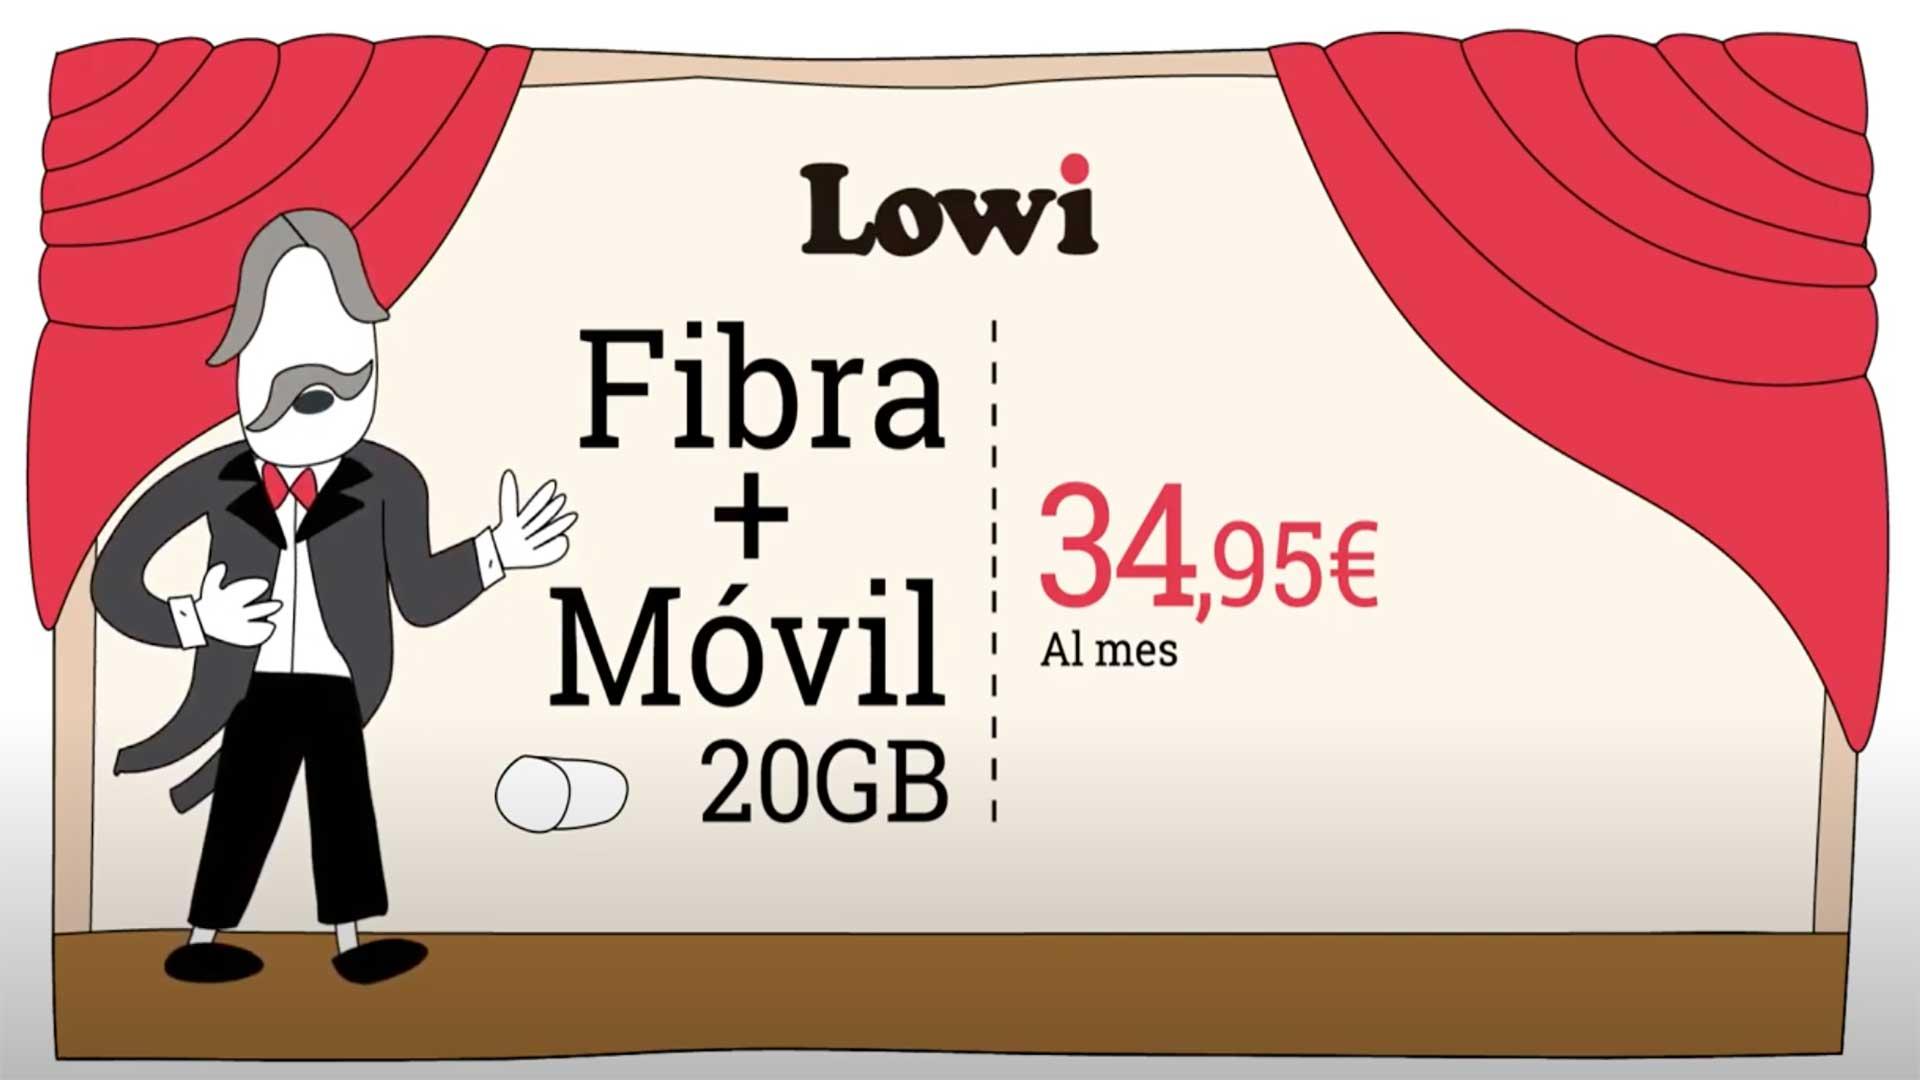 Lowi tarifa fibra y móvil barata, mayo 2020